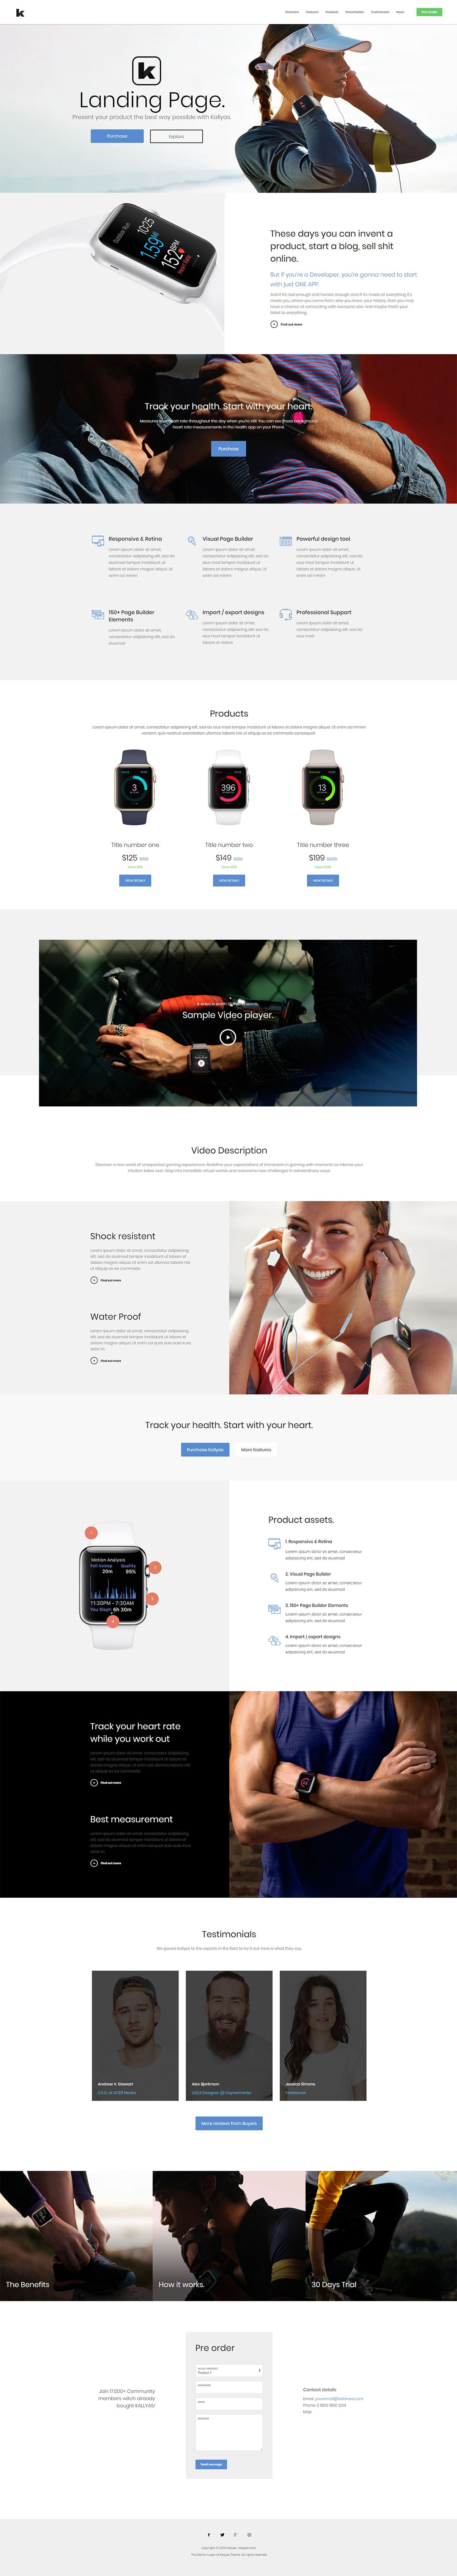 App Landing Page – Free PSD Template | Hogash Studio